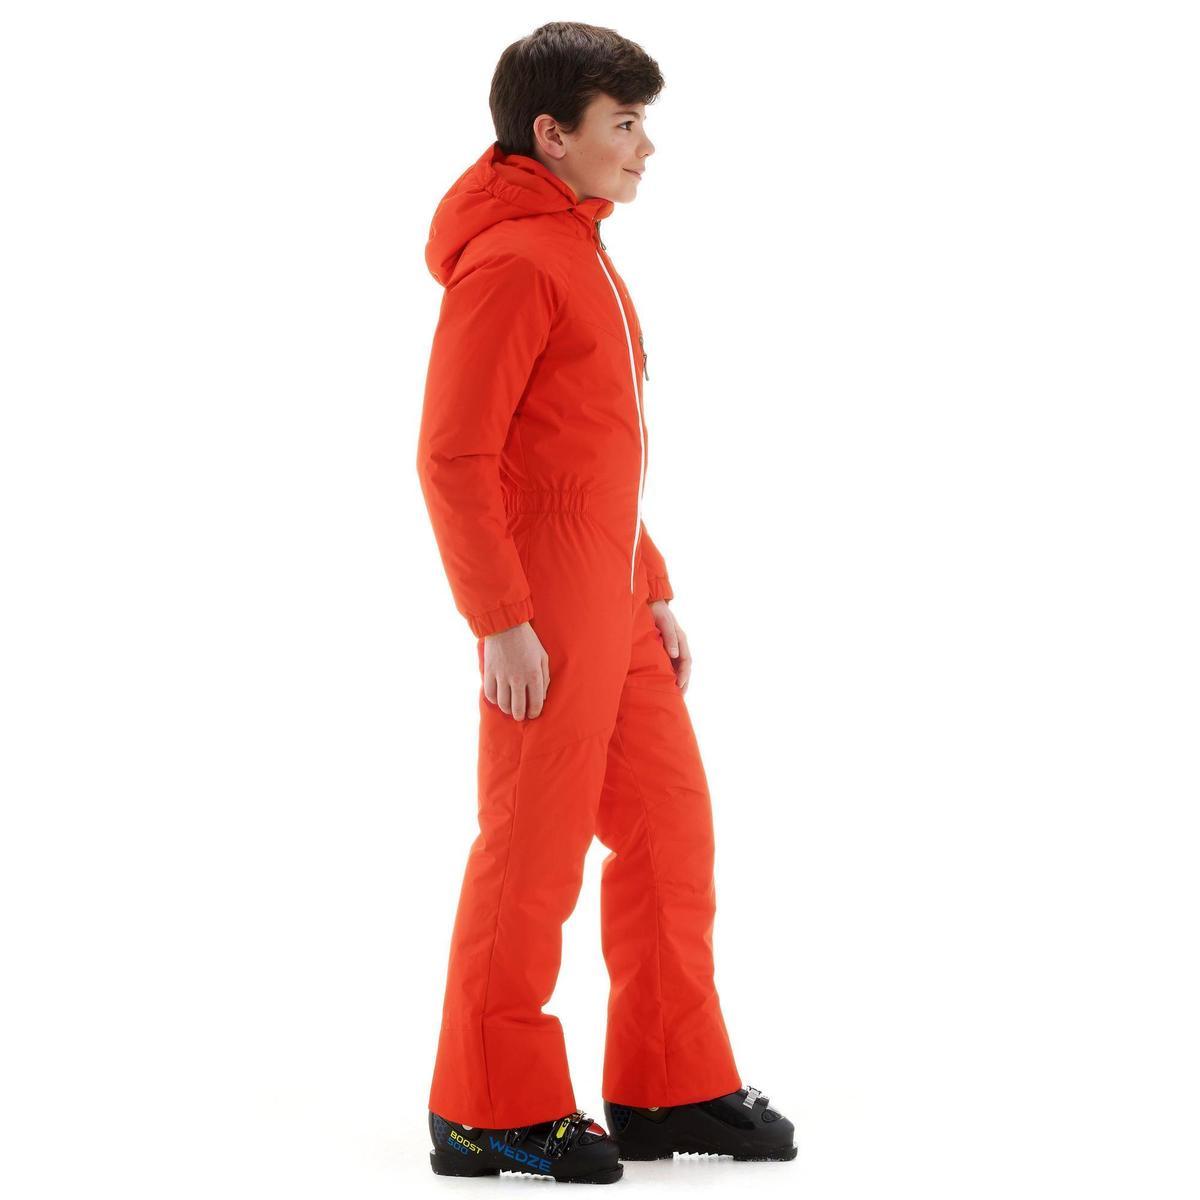 Bild 4 von Skianzug GL 100 Kinder rot/orange